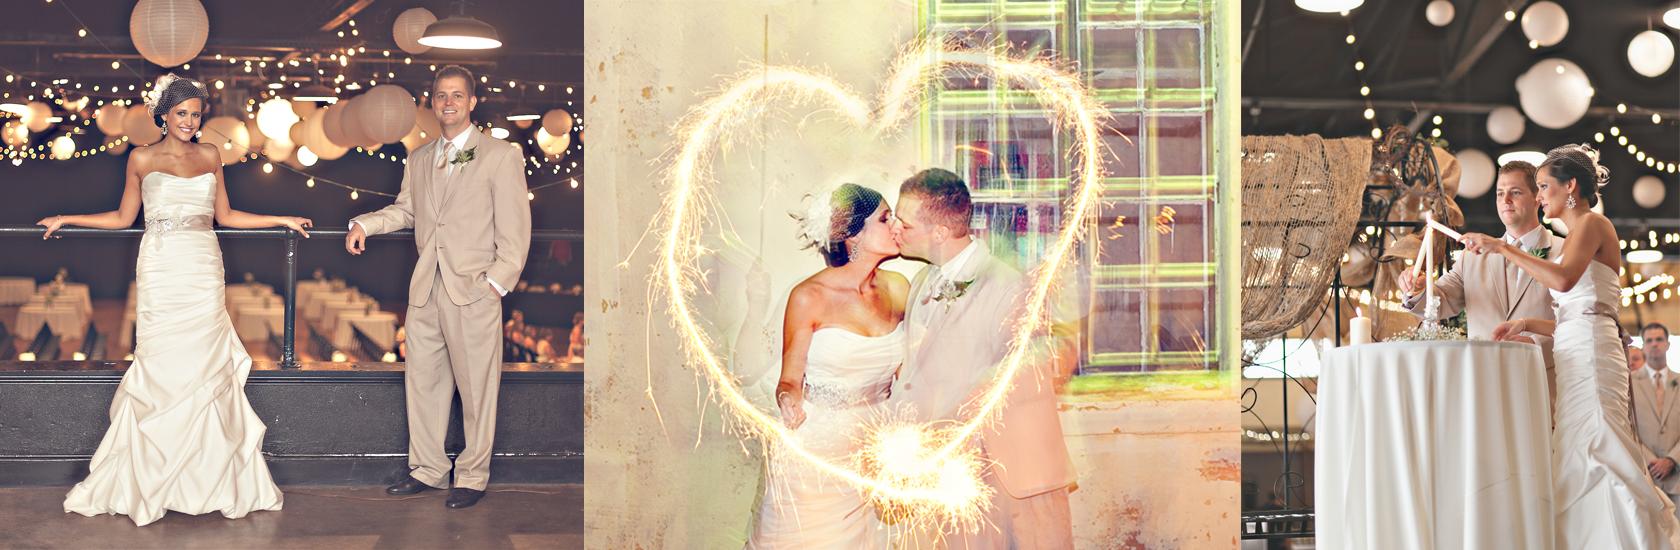 wedding_rapp_1